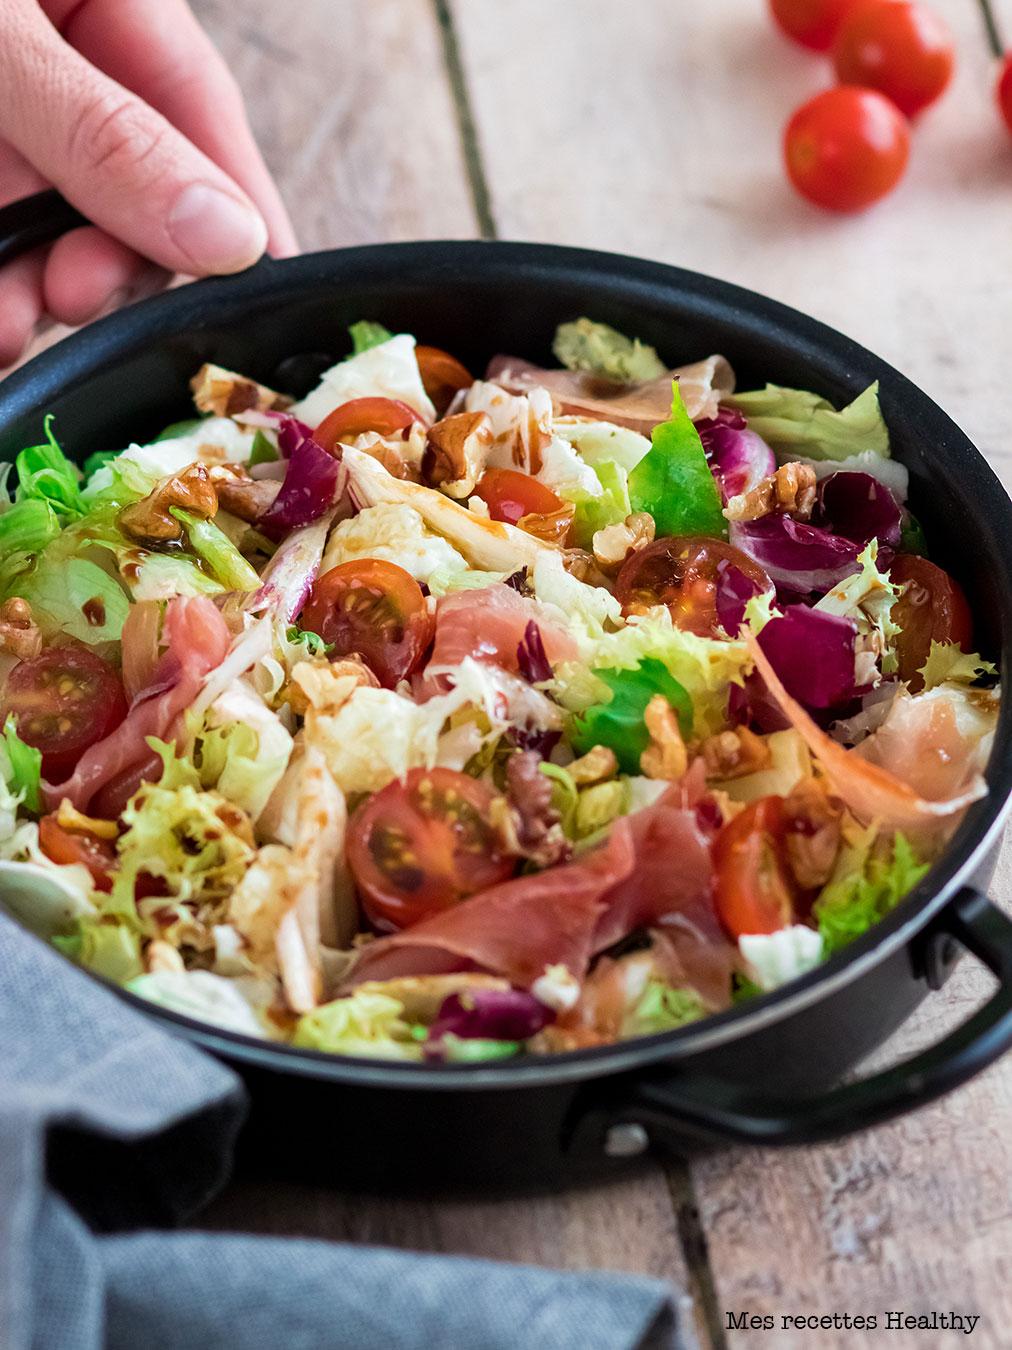 recette healthy-salade mozzarella-jambon sec-sain